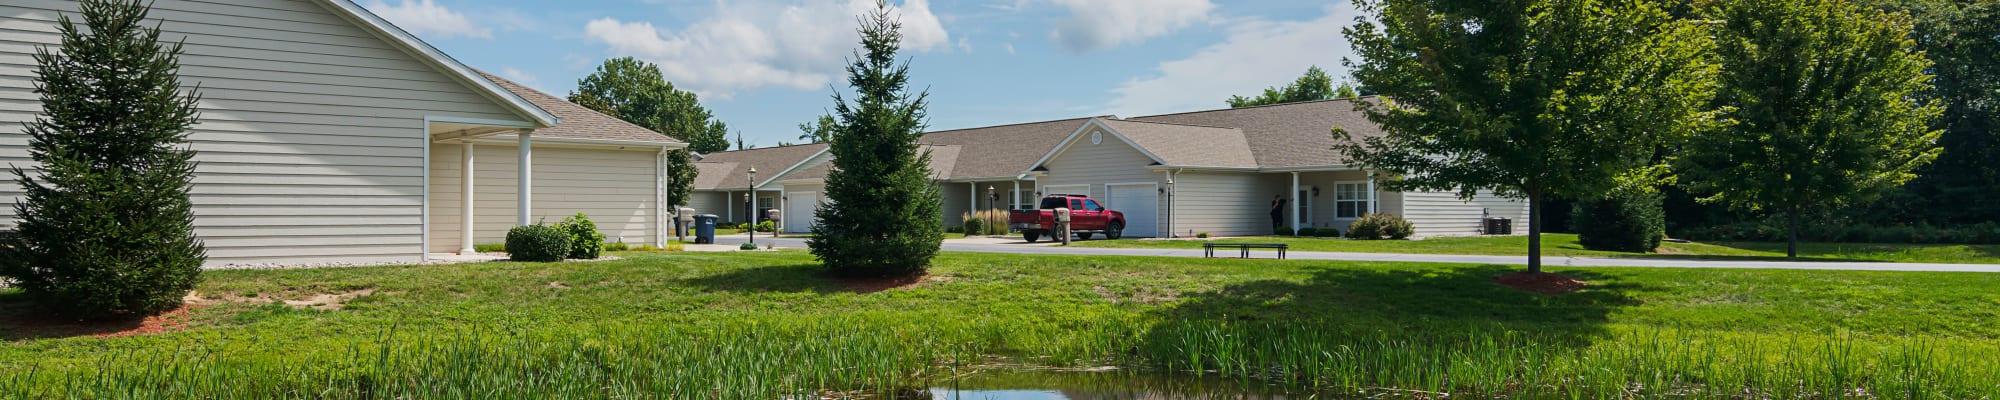 Senior living options at the senior living community in Michigan City Indiana